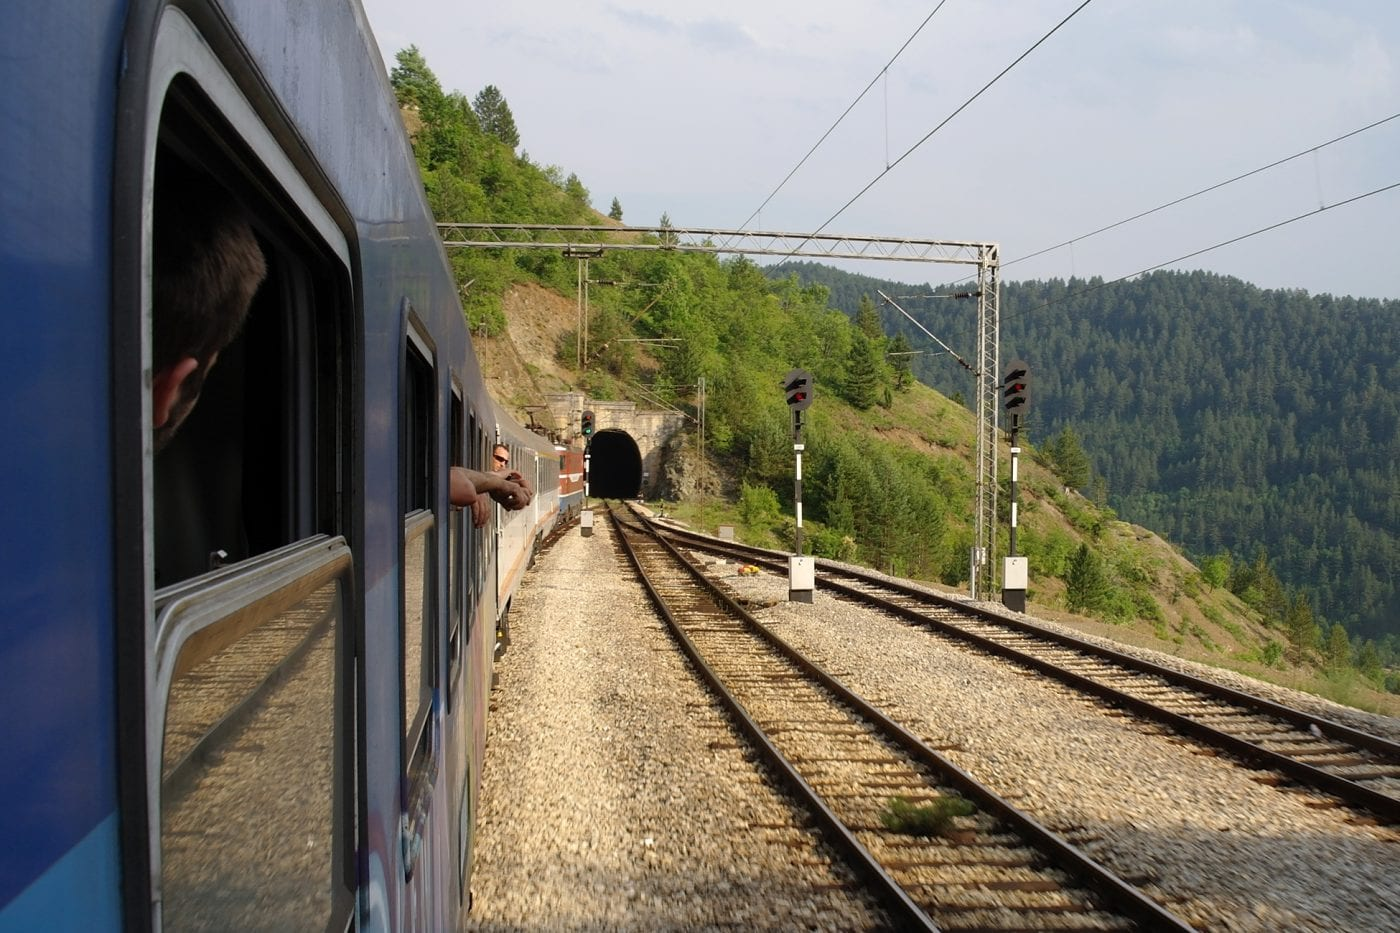 belgrade to budva heading into a tunnel